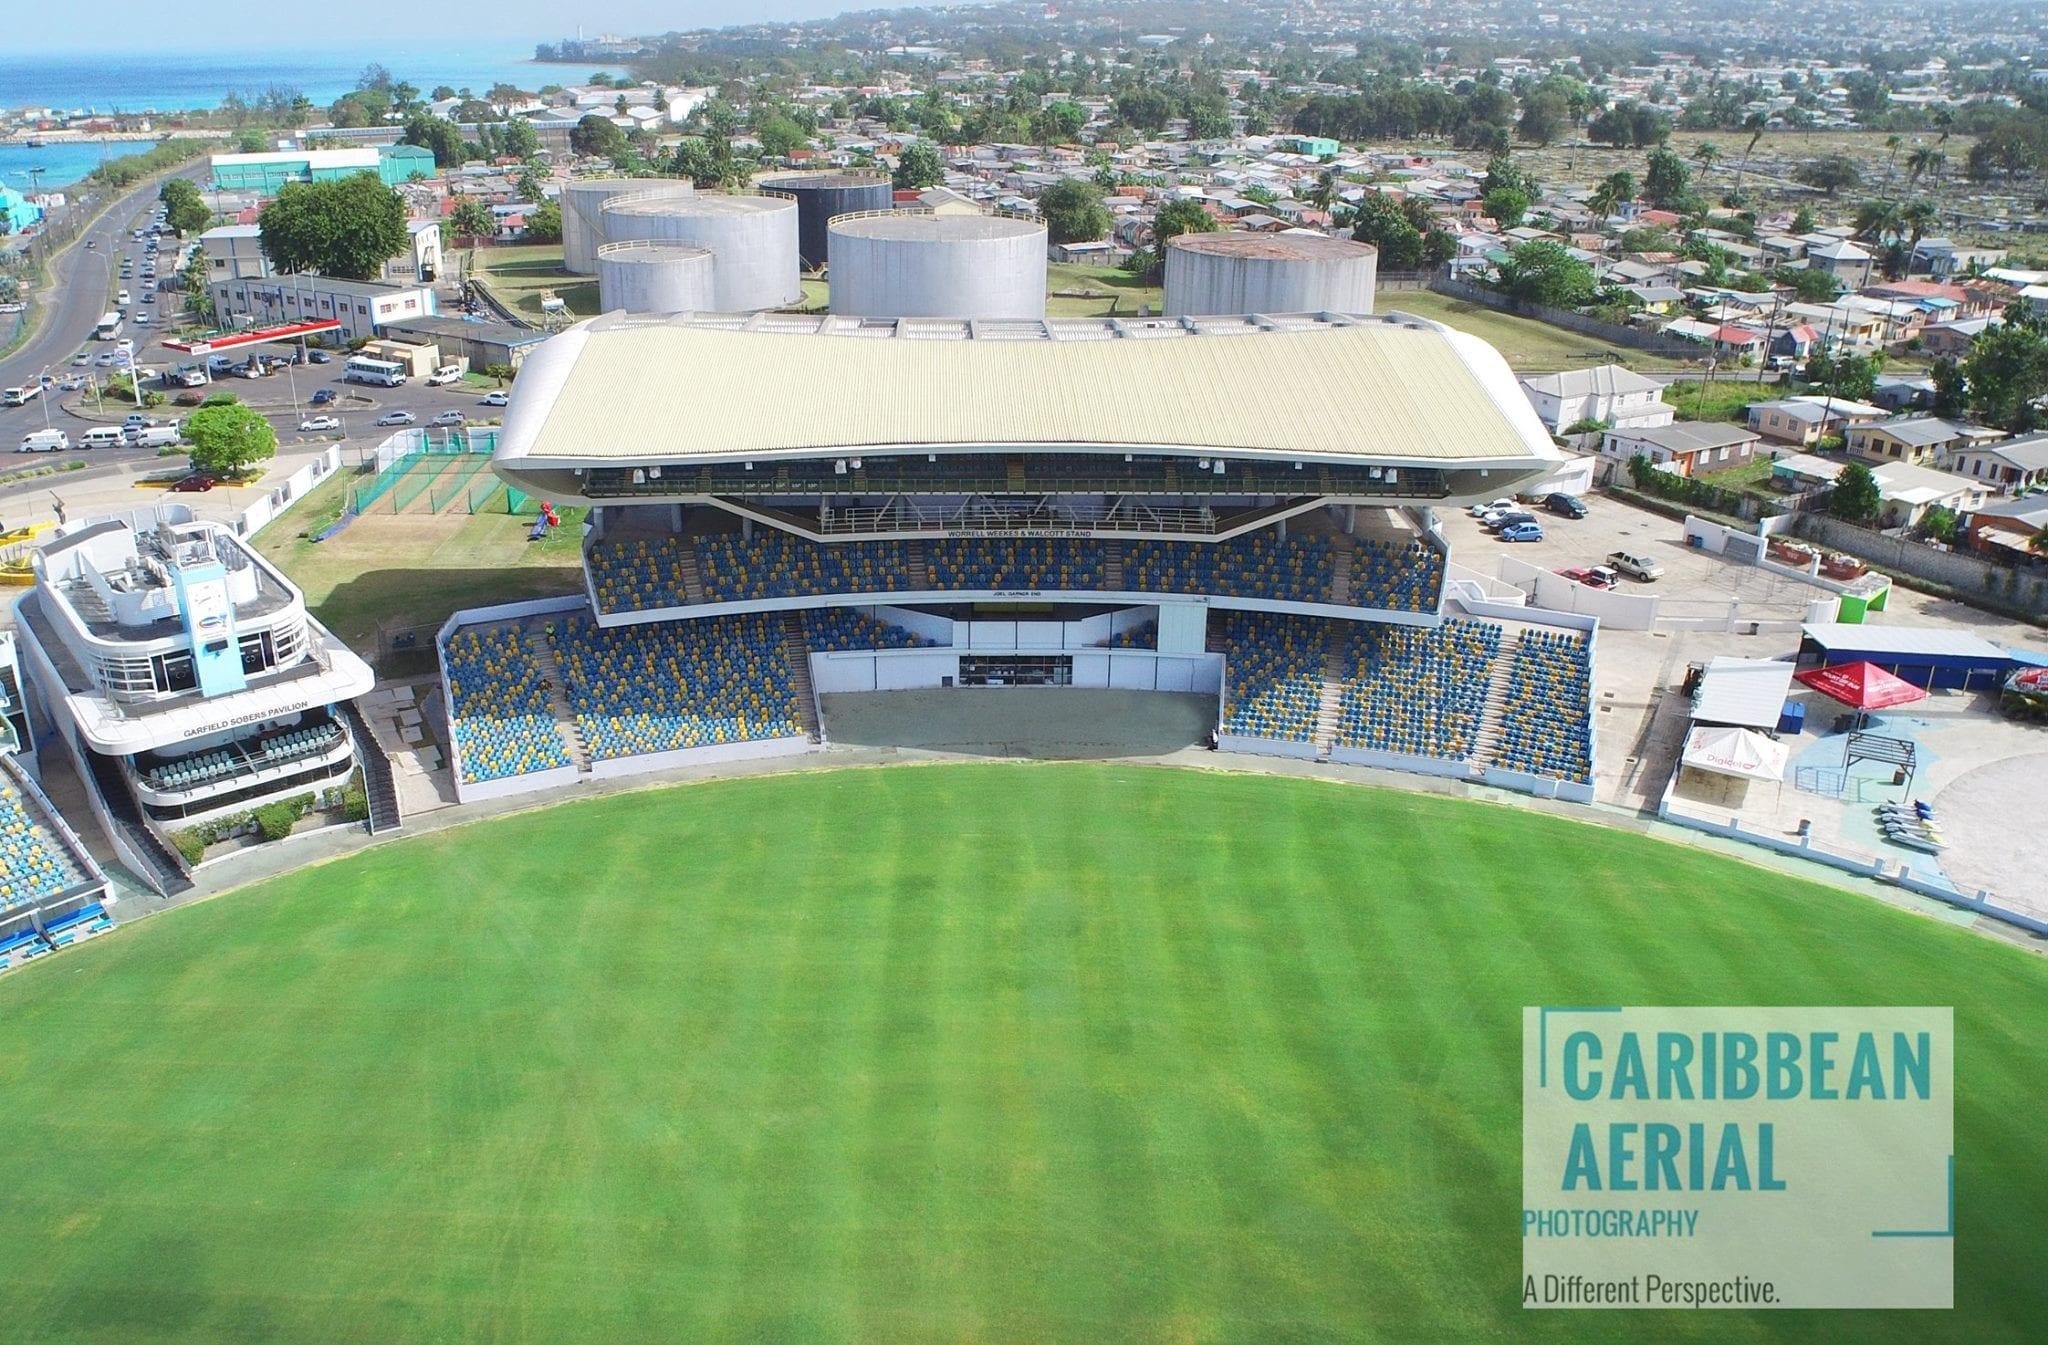 caribbean-aerial-photography-032